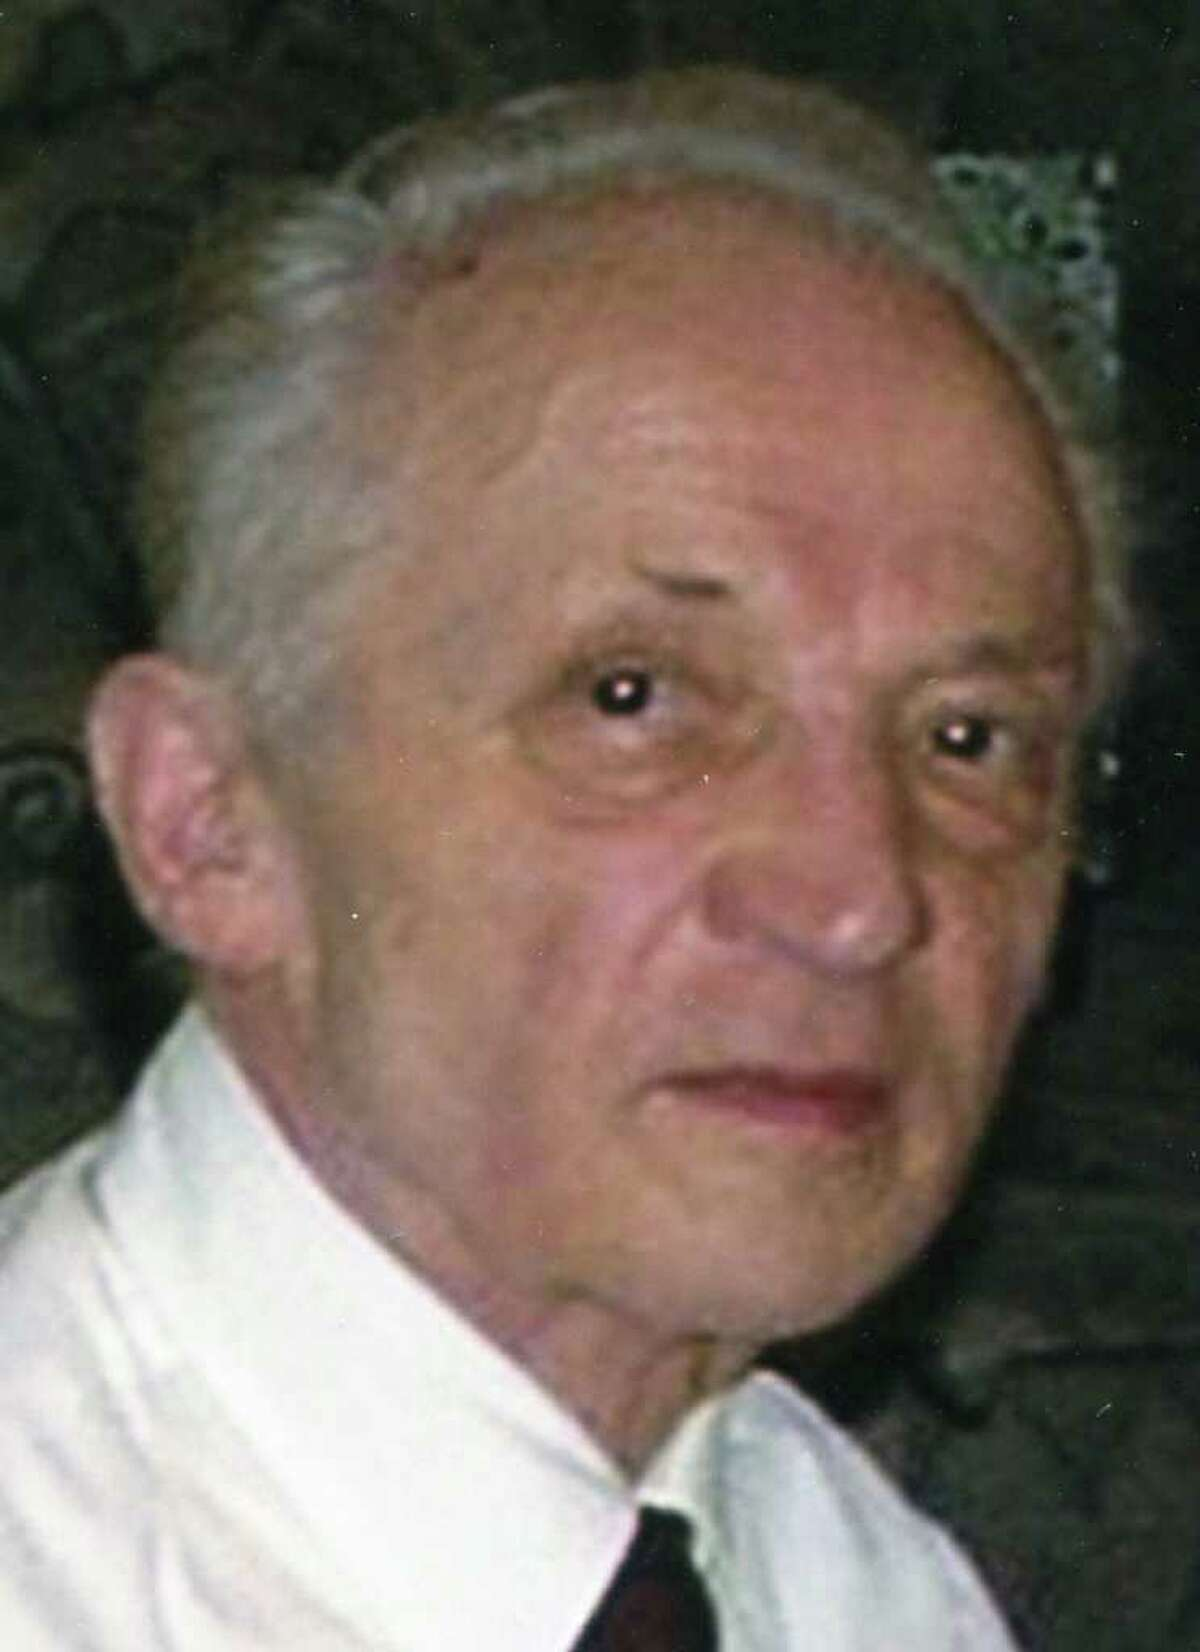 Peter Demianczyk